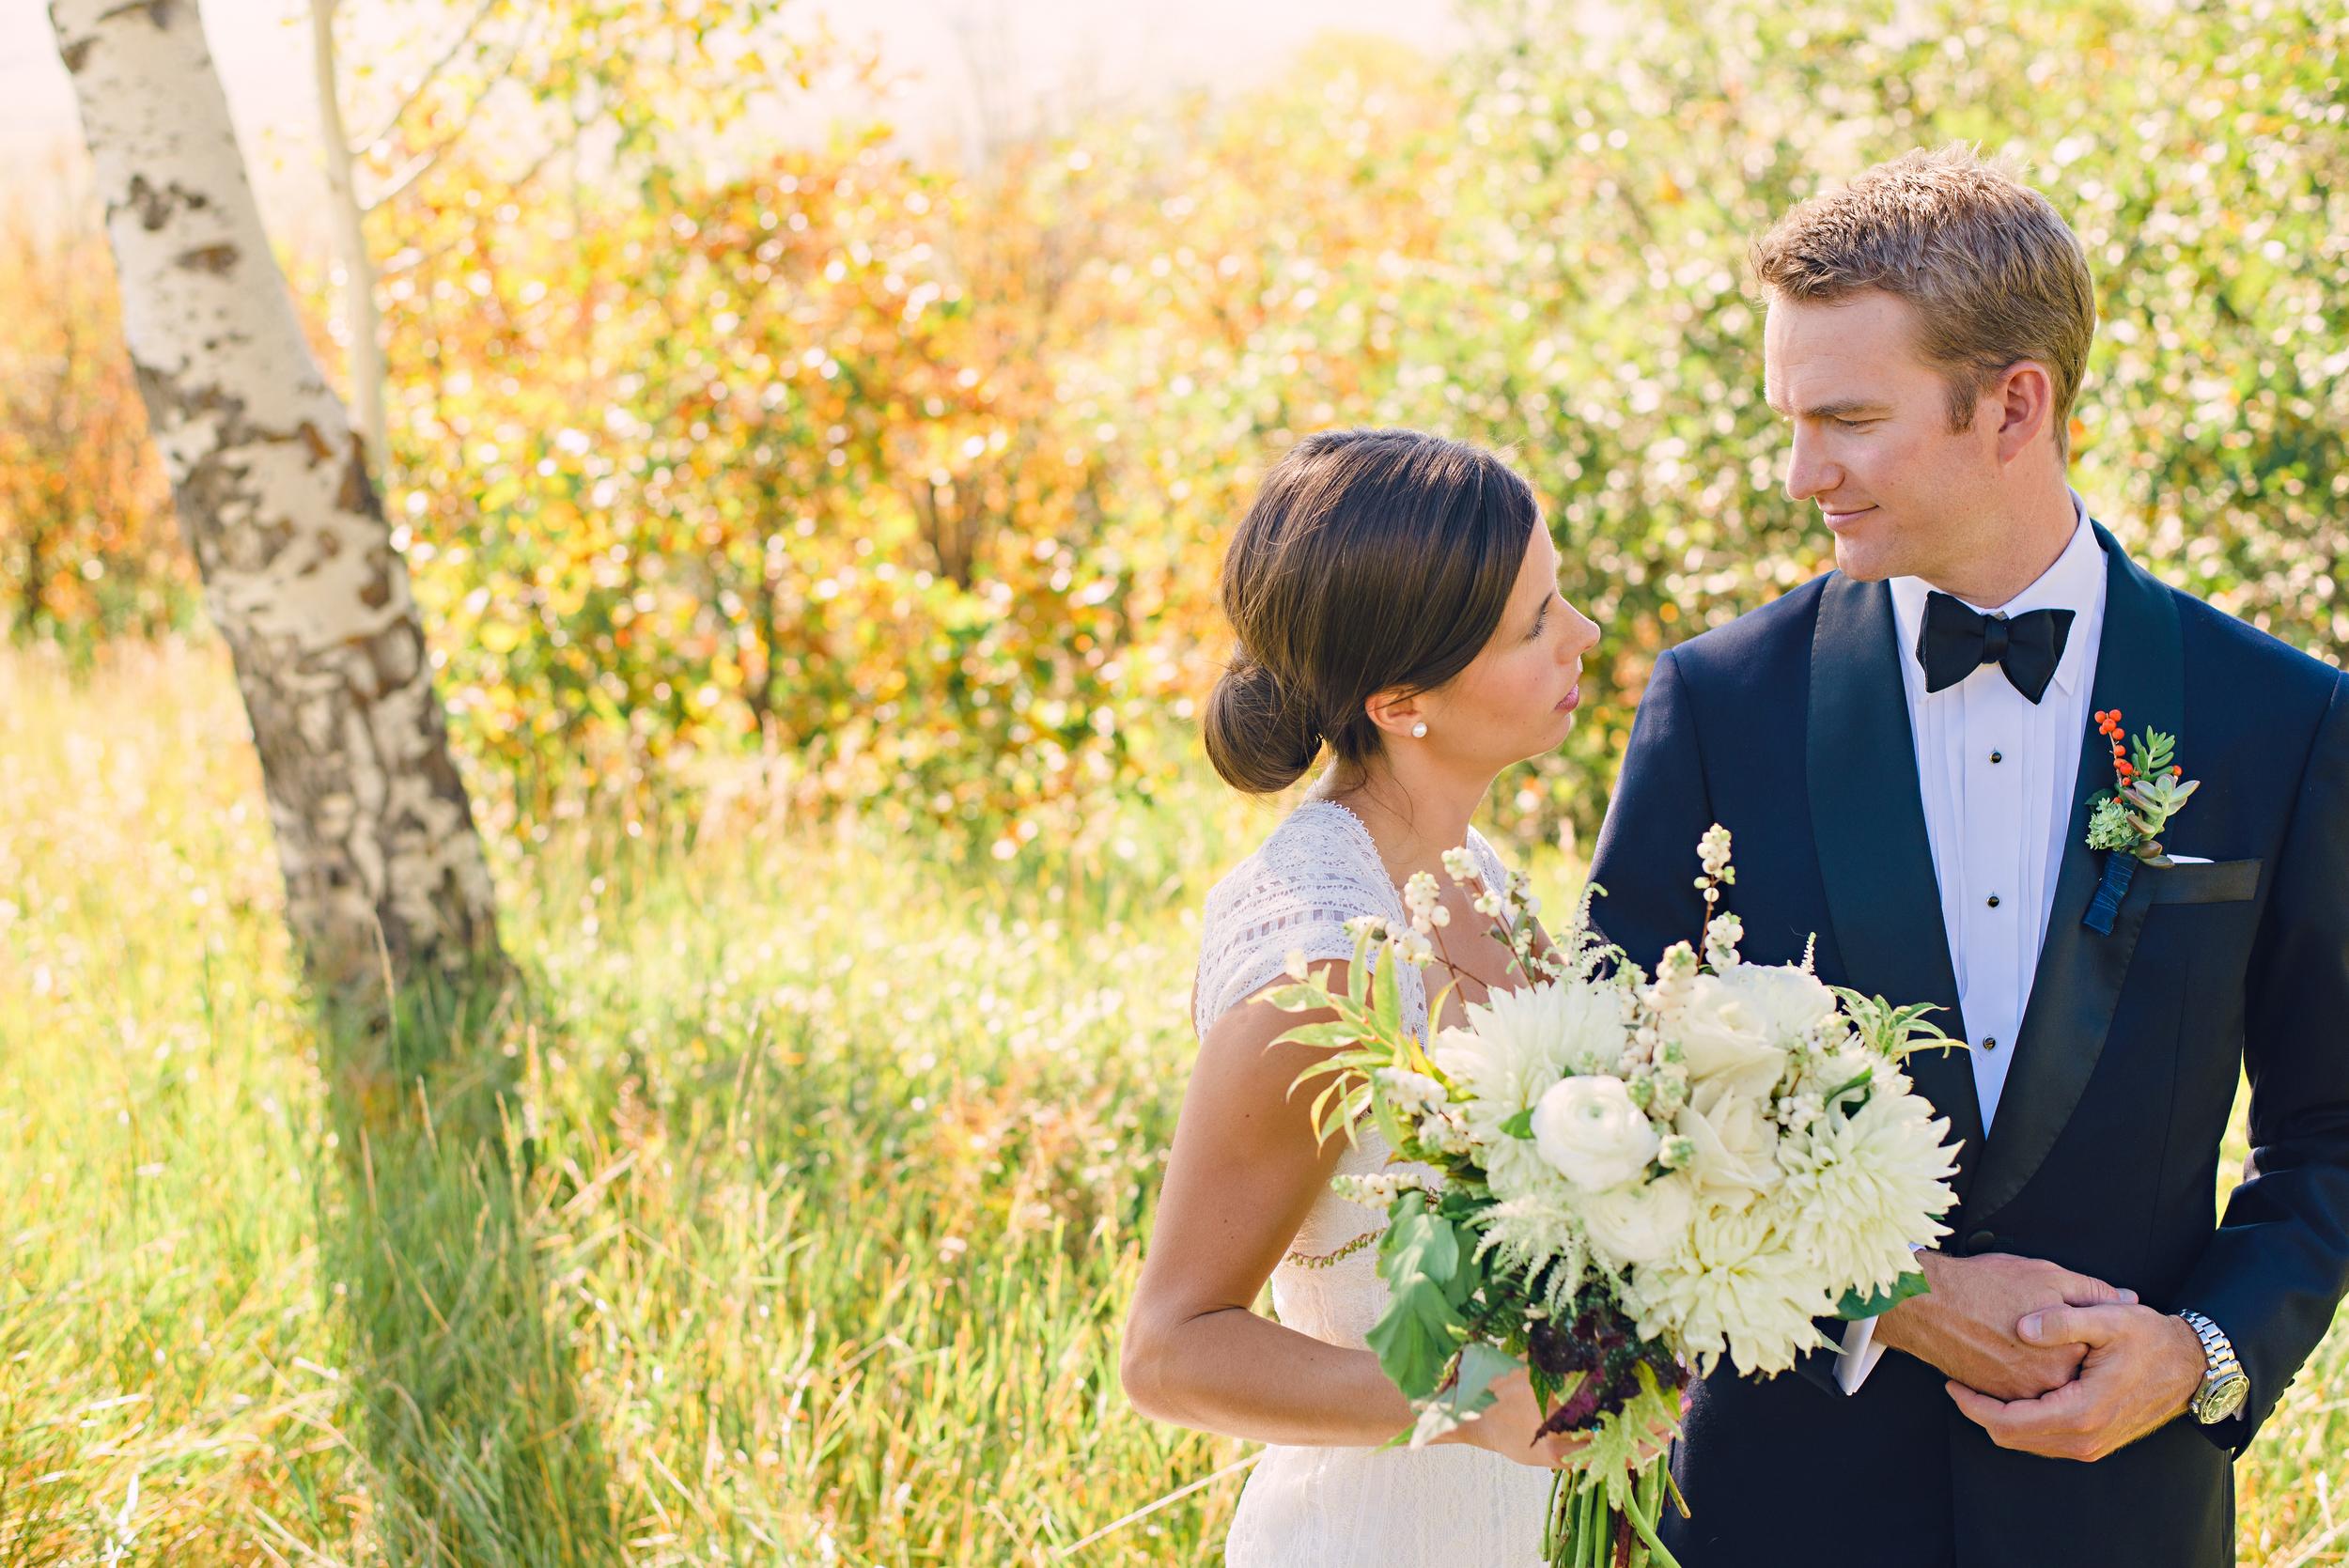 Brad&Libby_Wedding_Photos21725.jpg